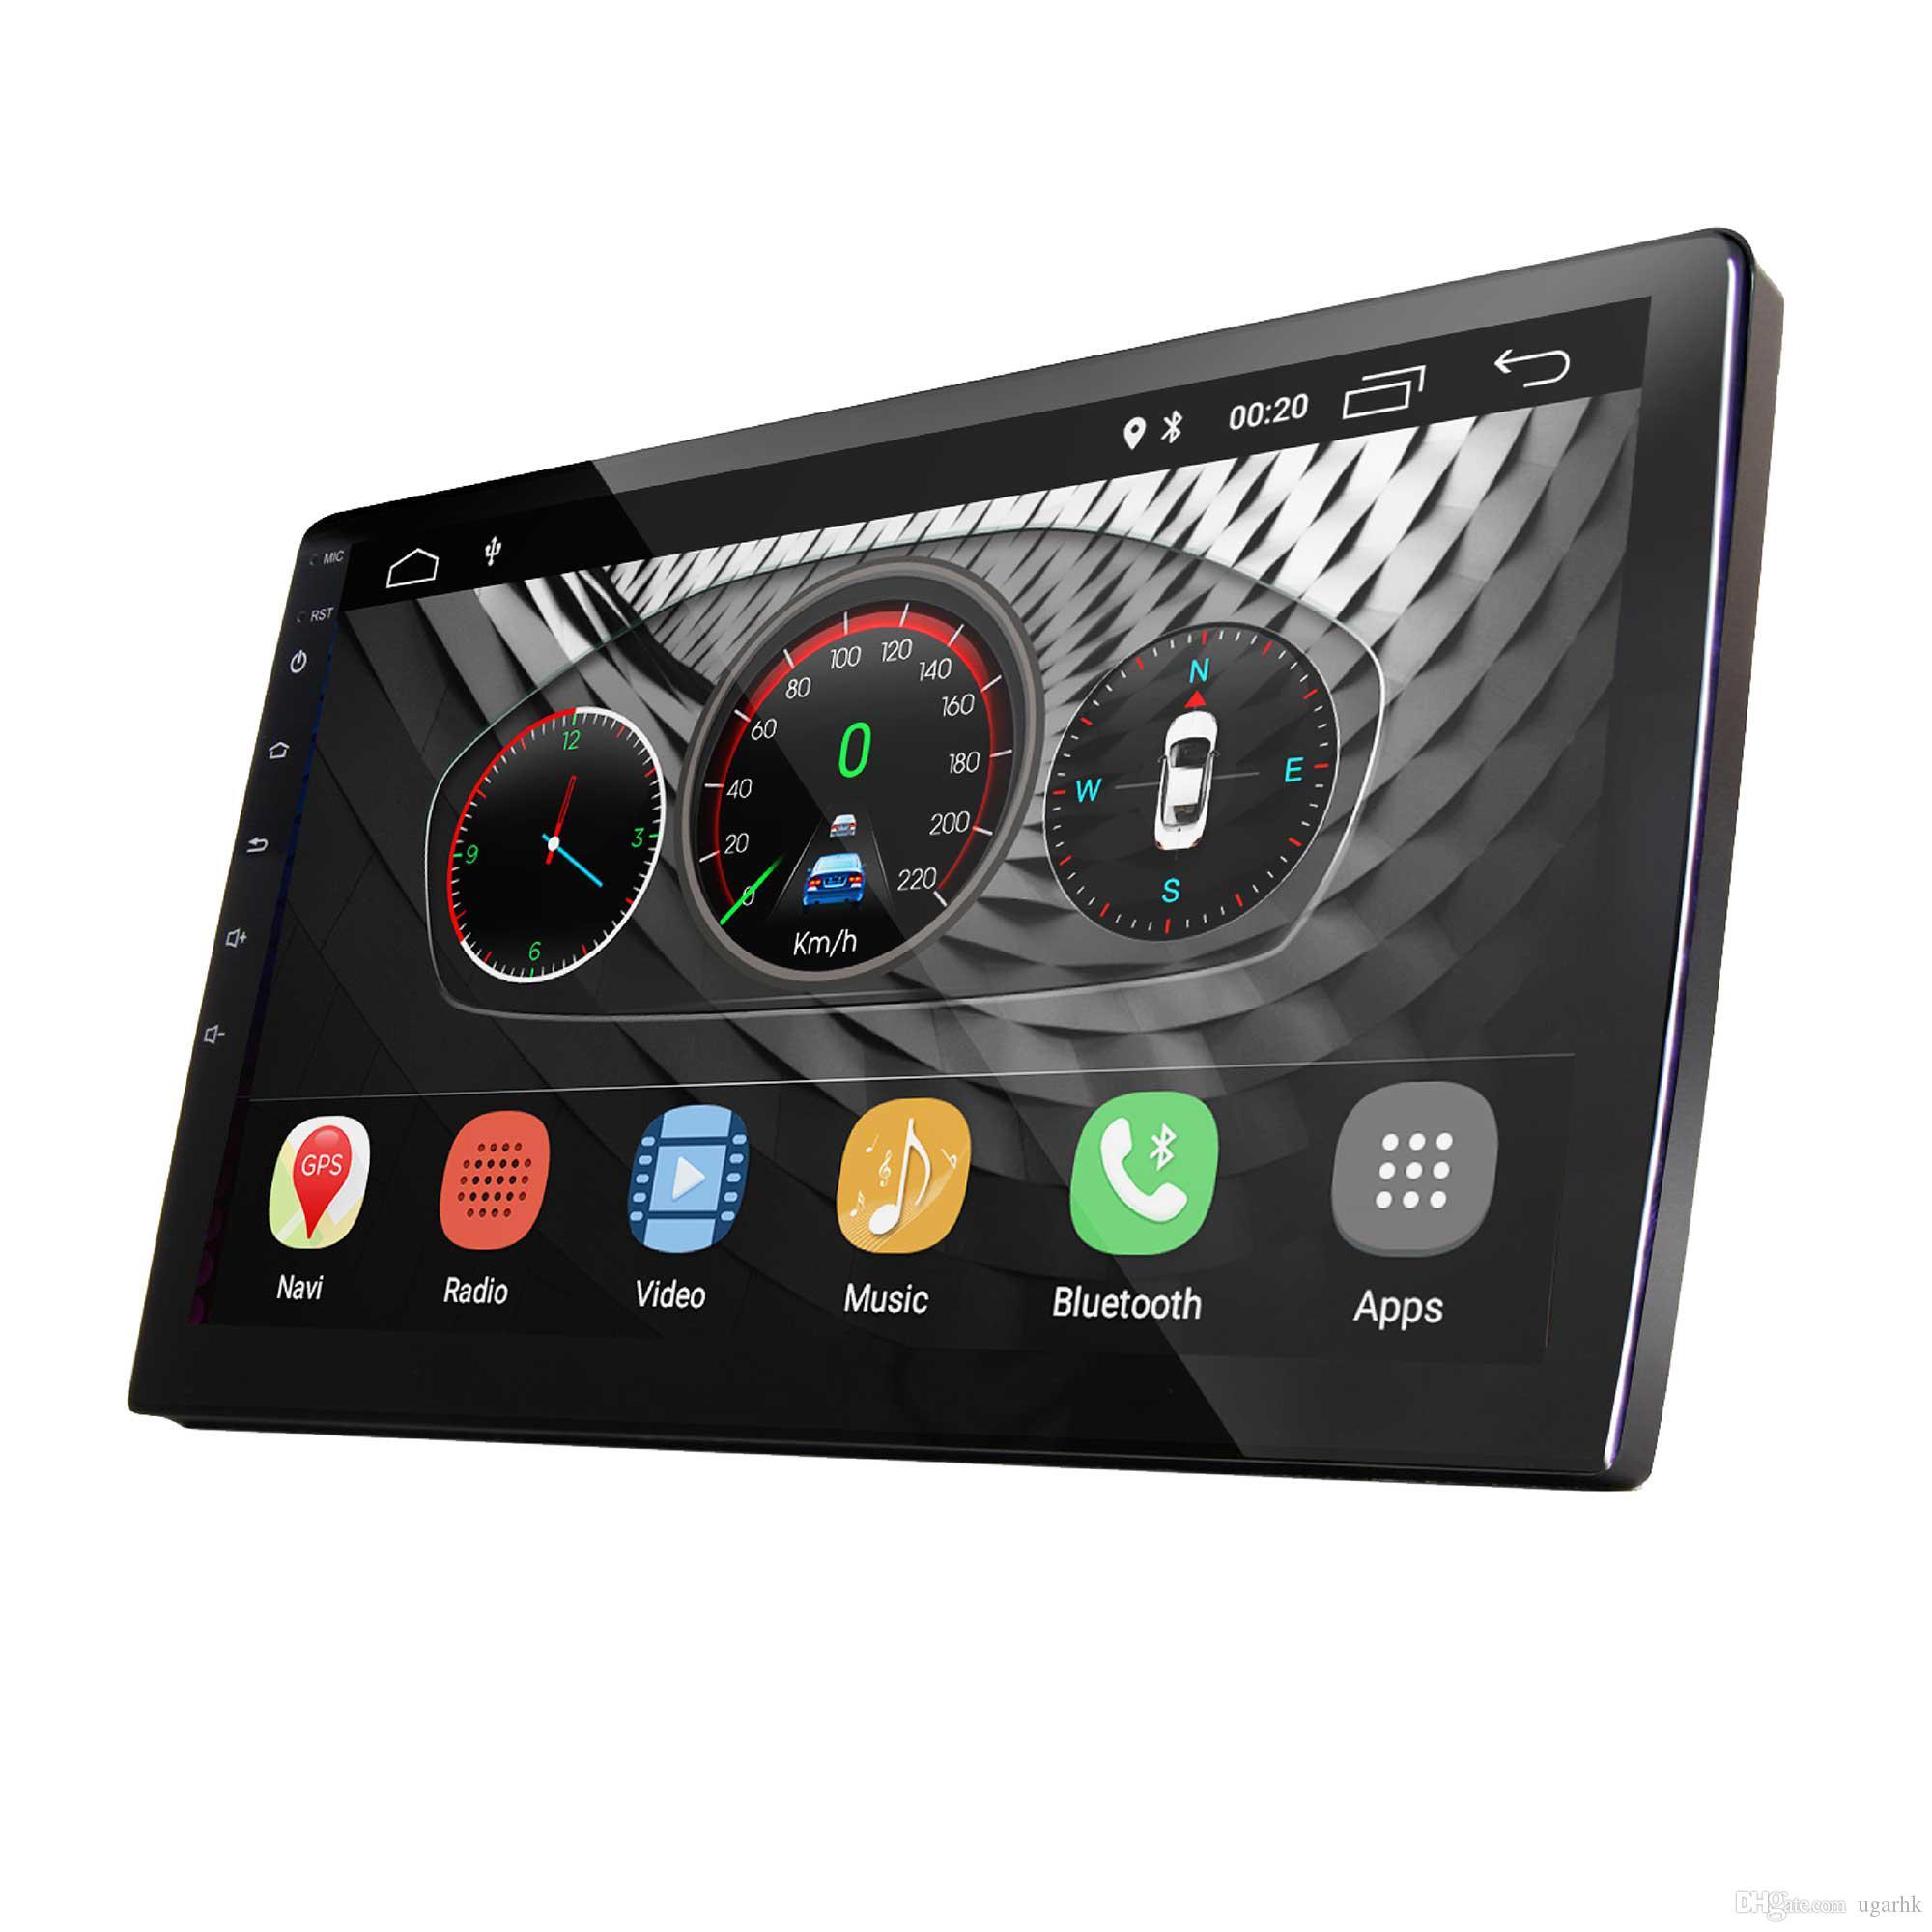 UGAR 10.1 inç Evrensel Genişletilmiş Araba DVD Android 8.1 Kafa Ünitesi DDR 2 GB Çift Din Araba Ses Bluetooth WiFi ile Indash GPS Navigasyon